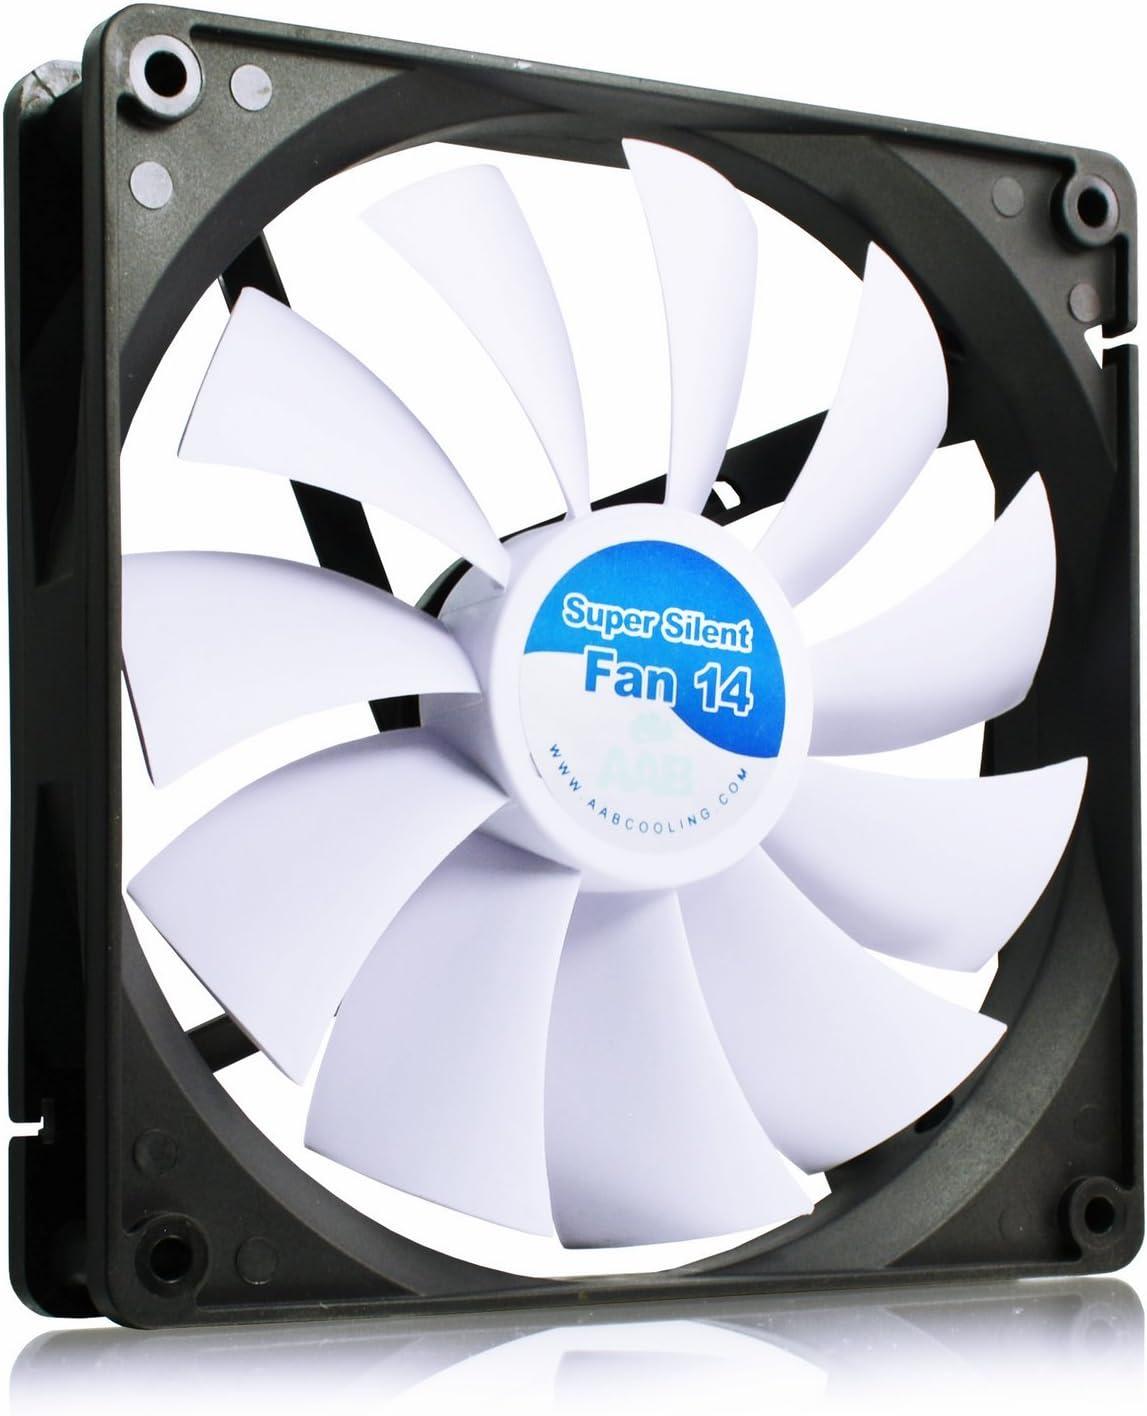 3D Printer Accessories Quiet Fan Silent and Efficient 50mm Fan with 4 Anti-vibration Pads 3D Printer Fan Silent Case Fan AAB Cooling Super Silent Fan 5